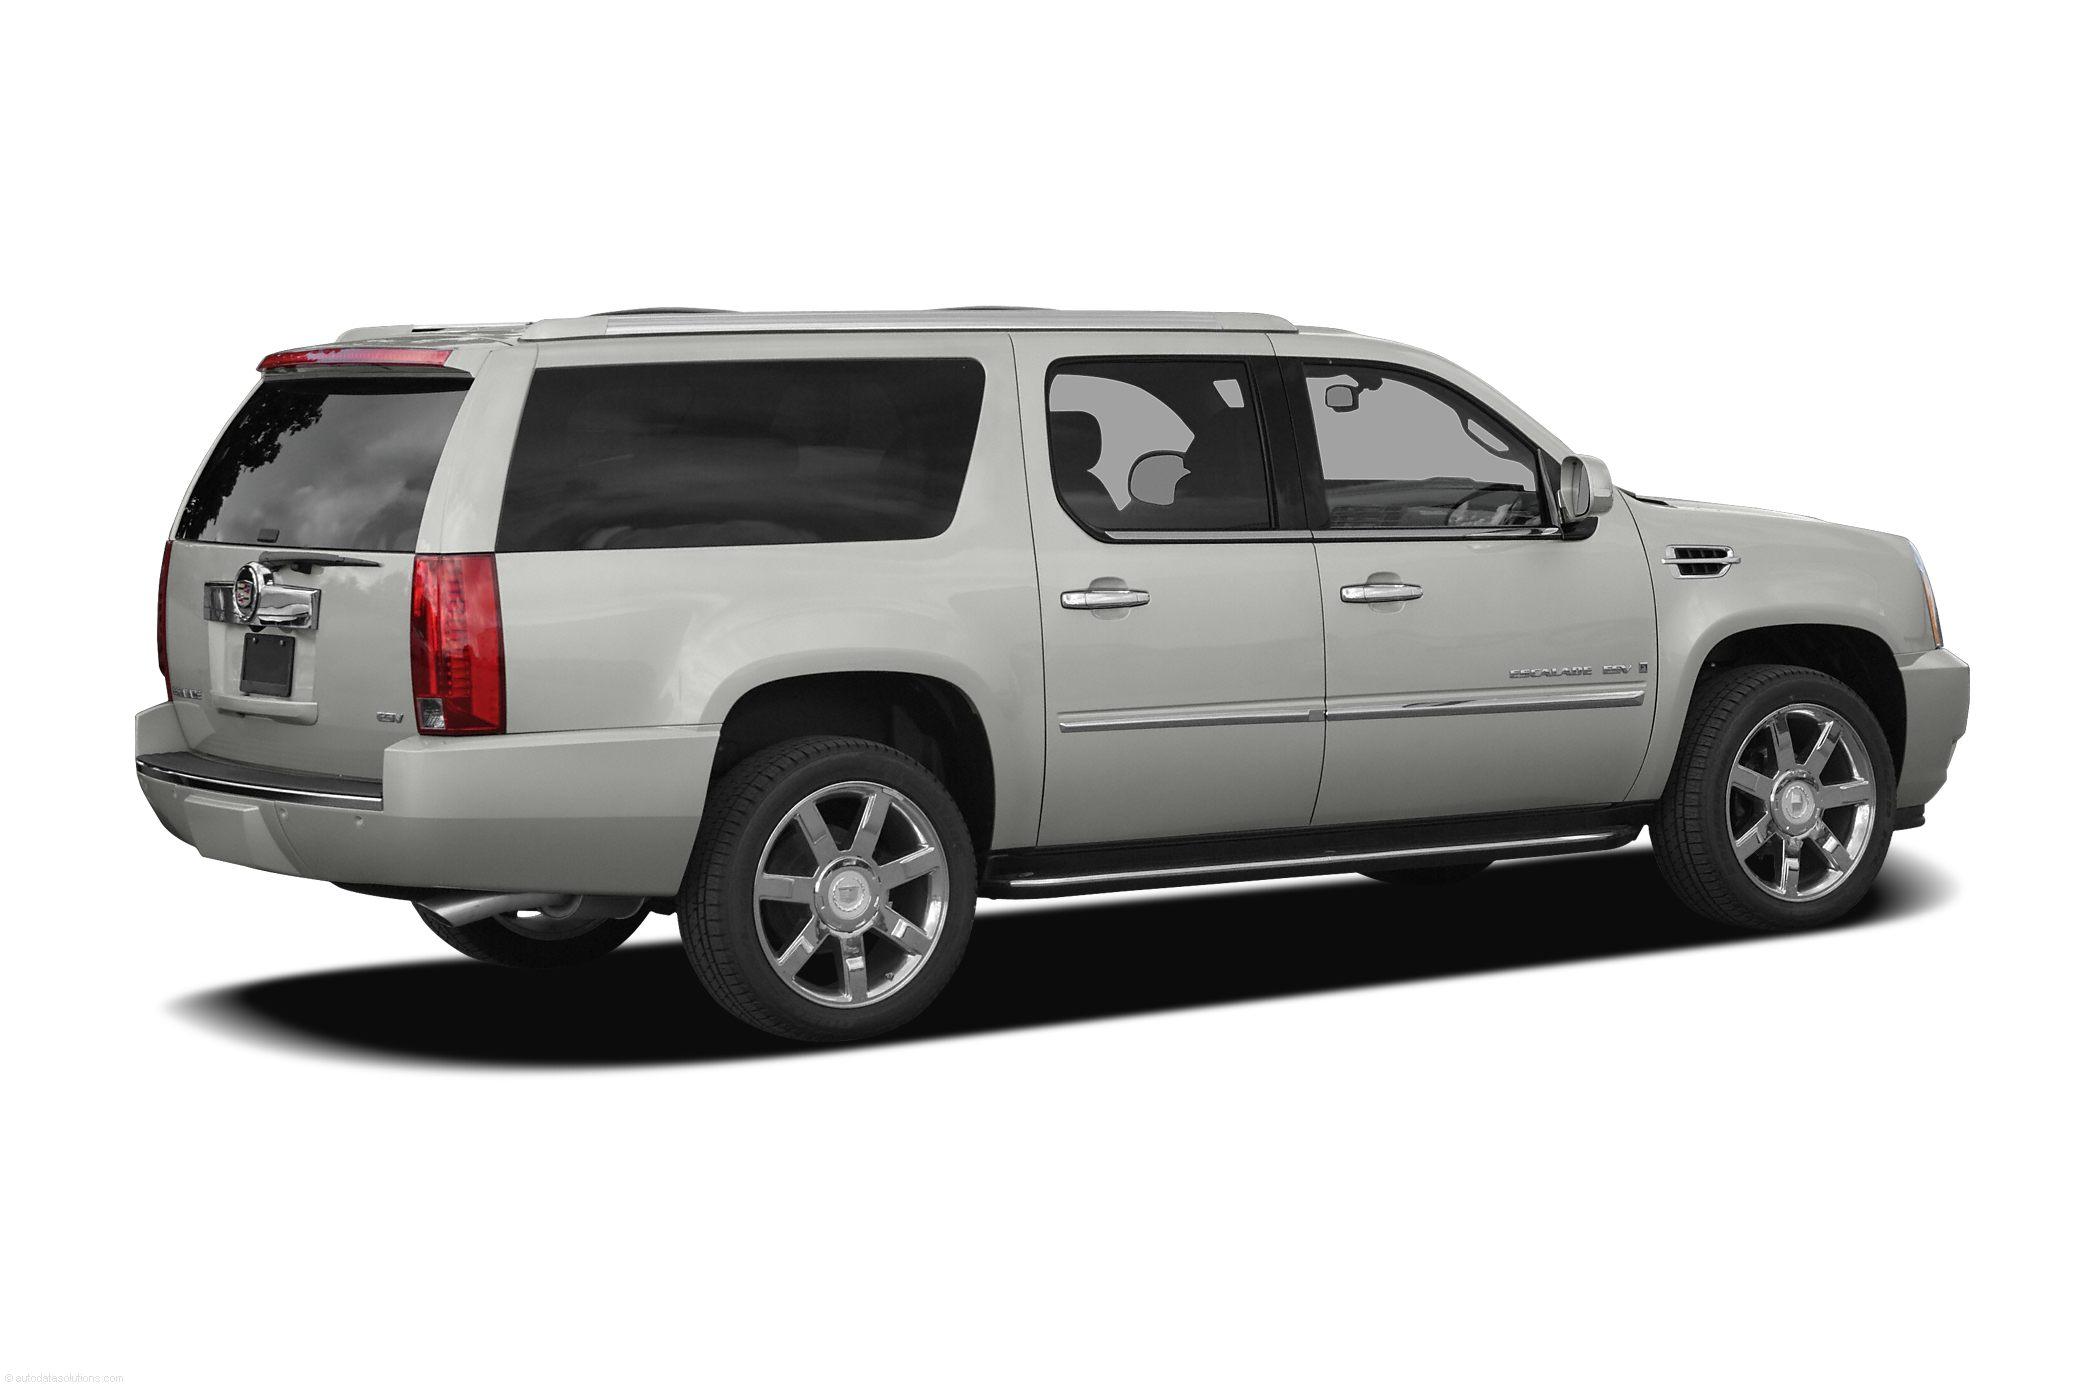 2010-Cadillac-Escalade-ESV-SUV-Base-4x2-Exterior-Back-Side-View